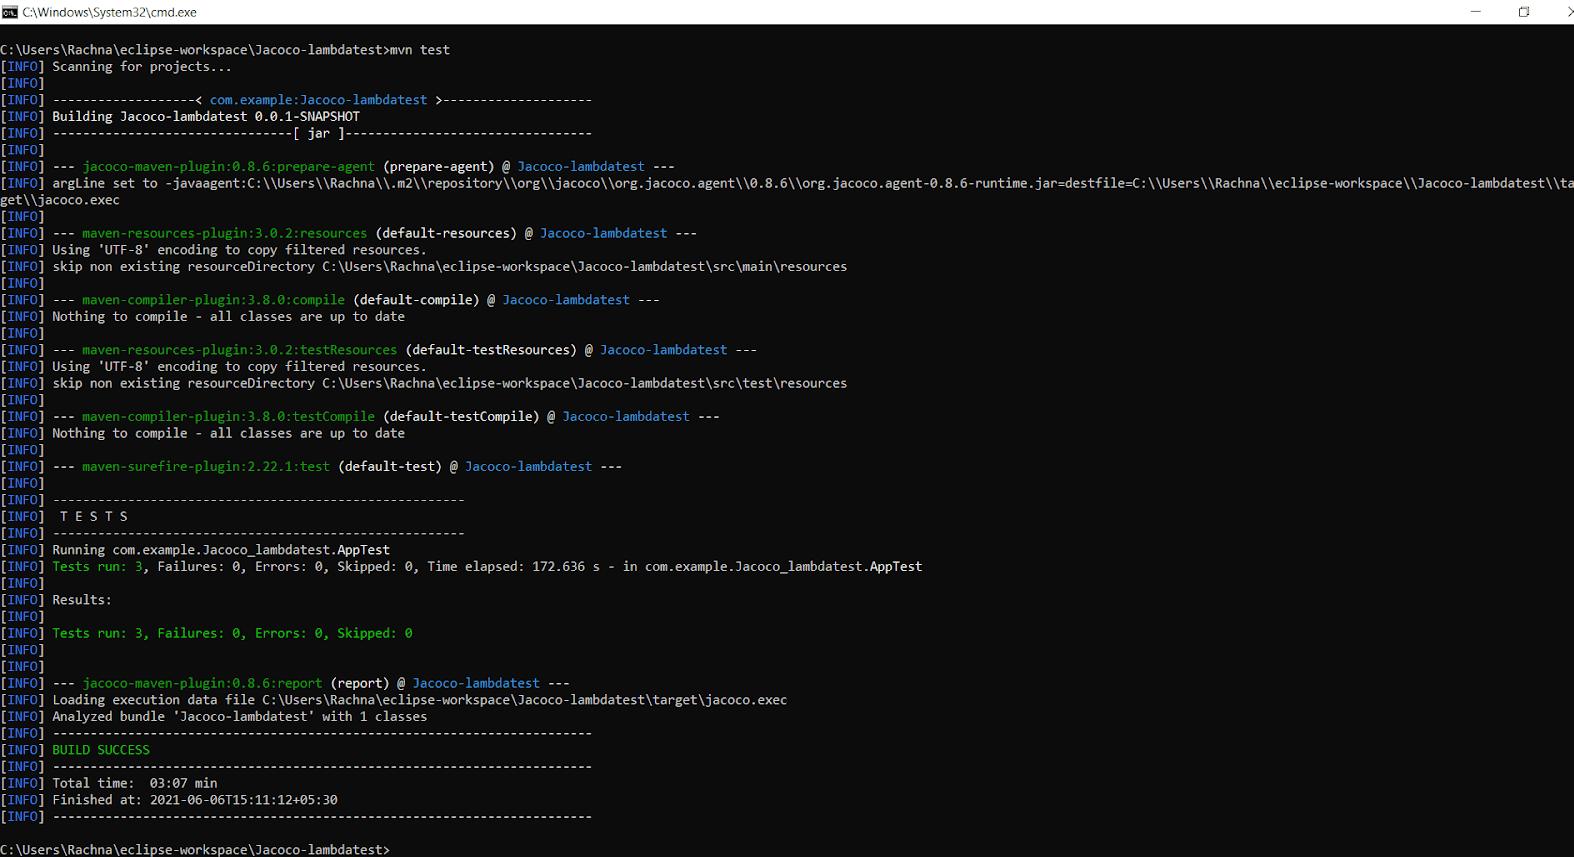 running the Maven Test Through Command,